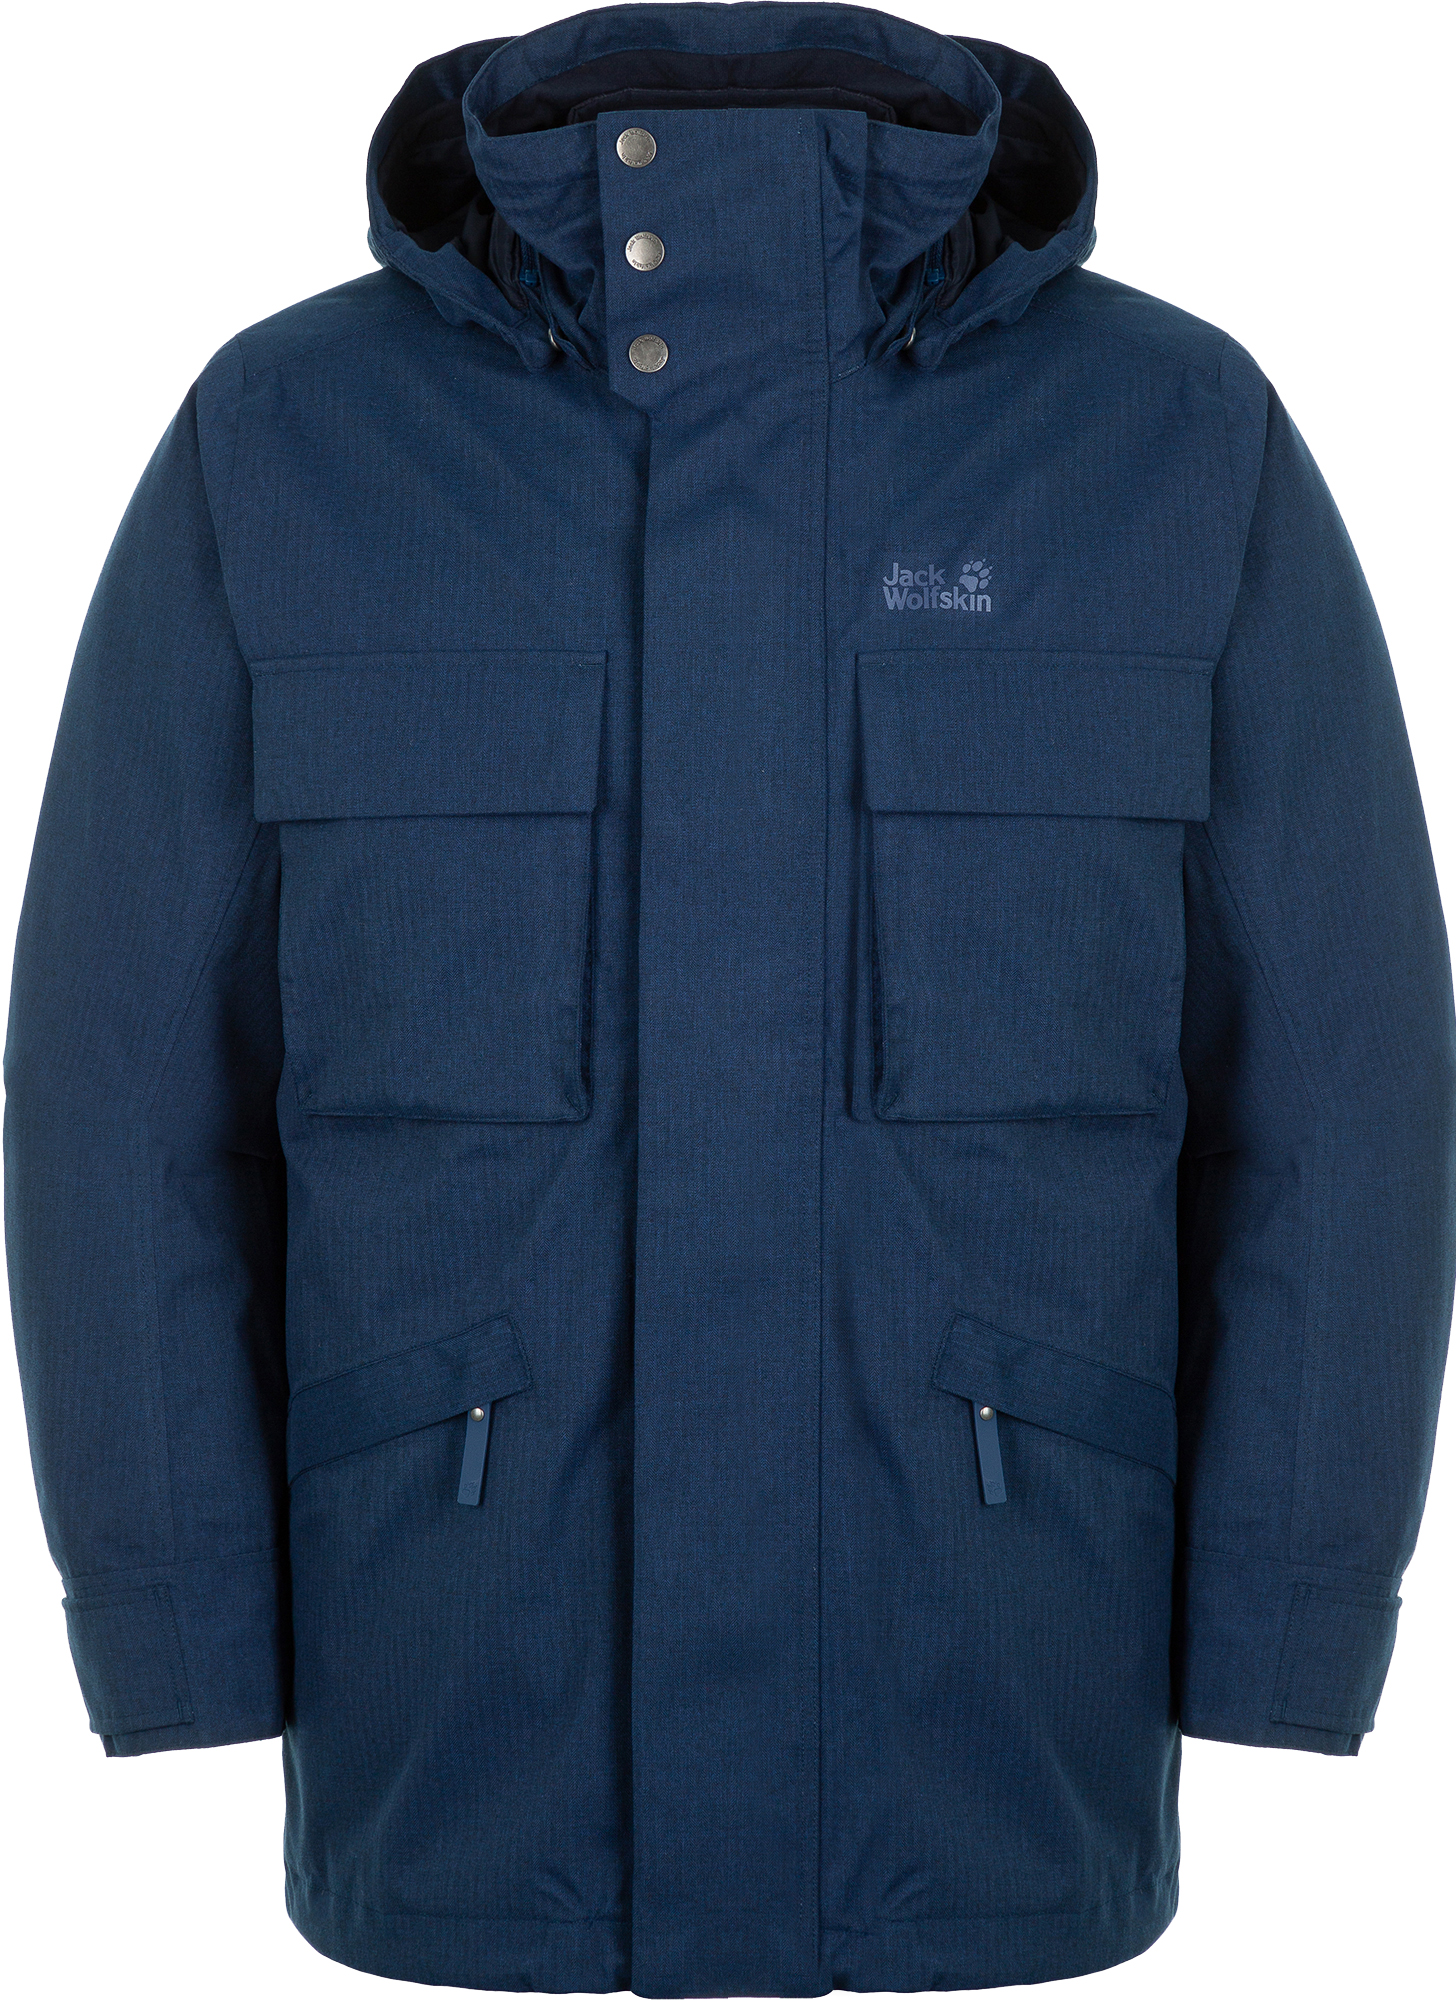 Jack Wolfskin Куртка 3 в 1 мужская Takamatsu, размер 58